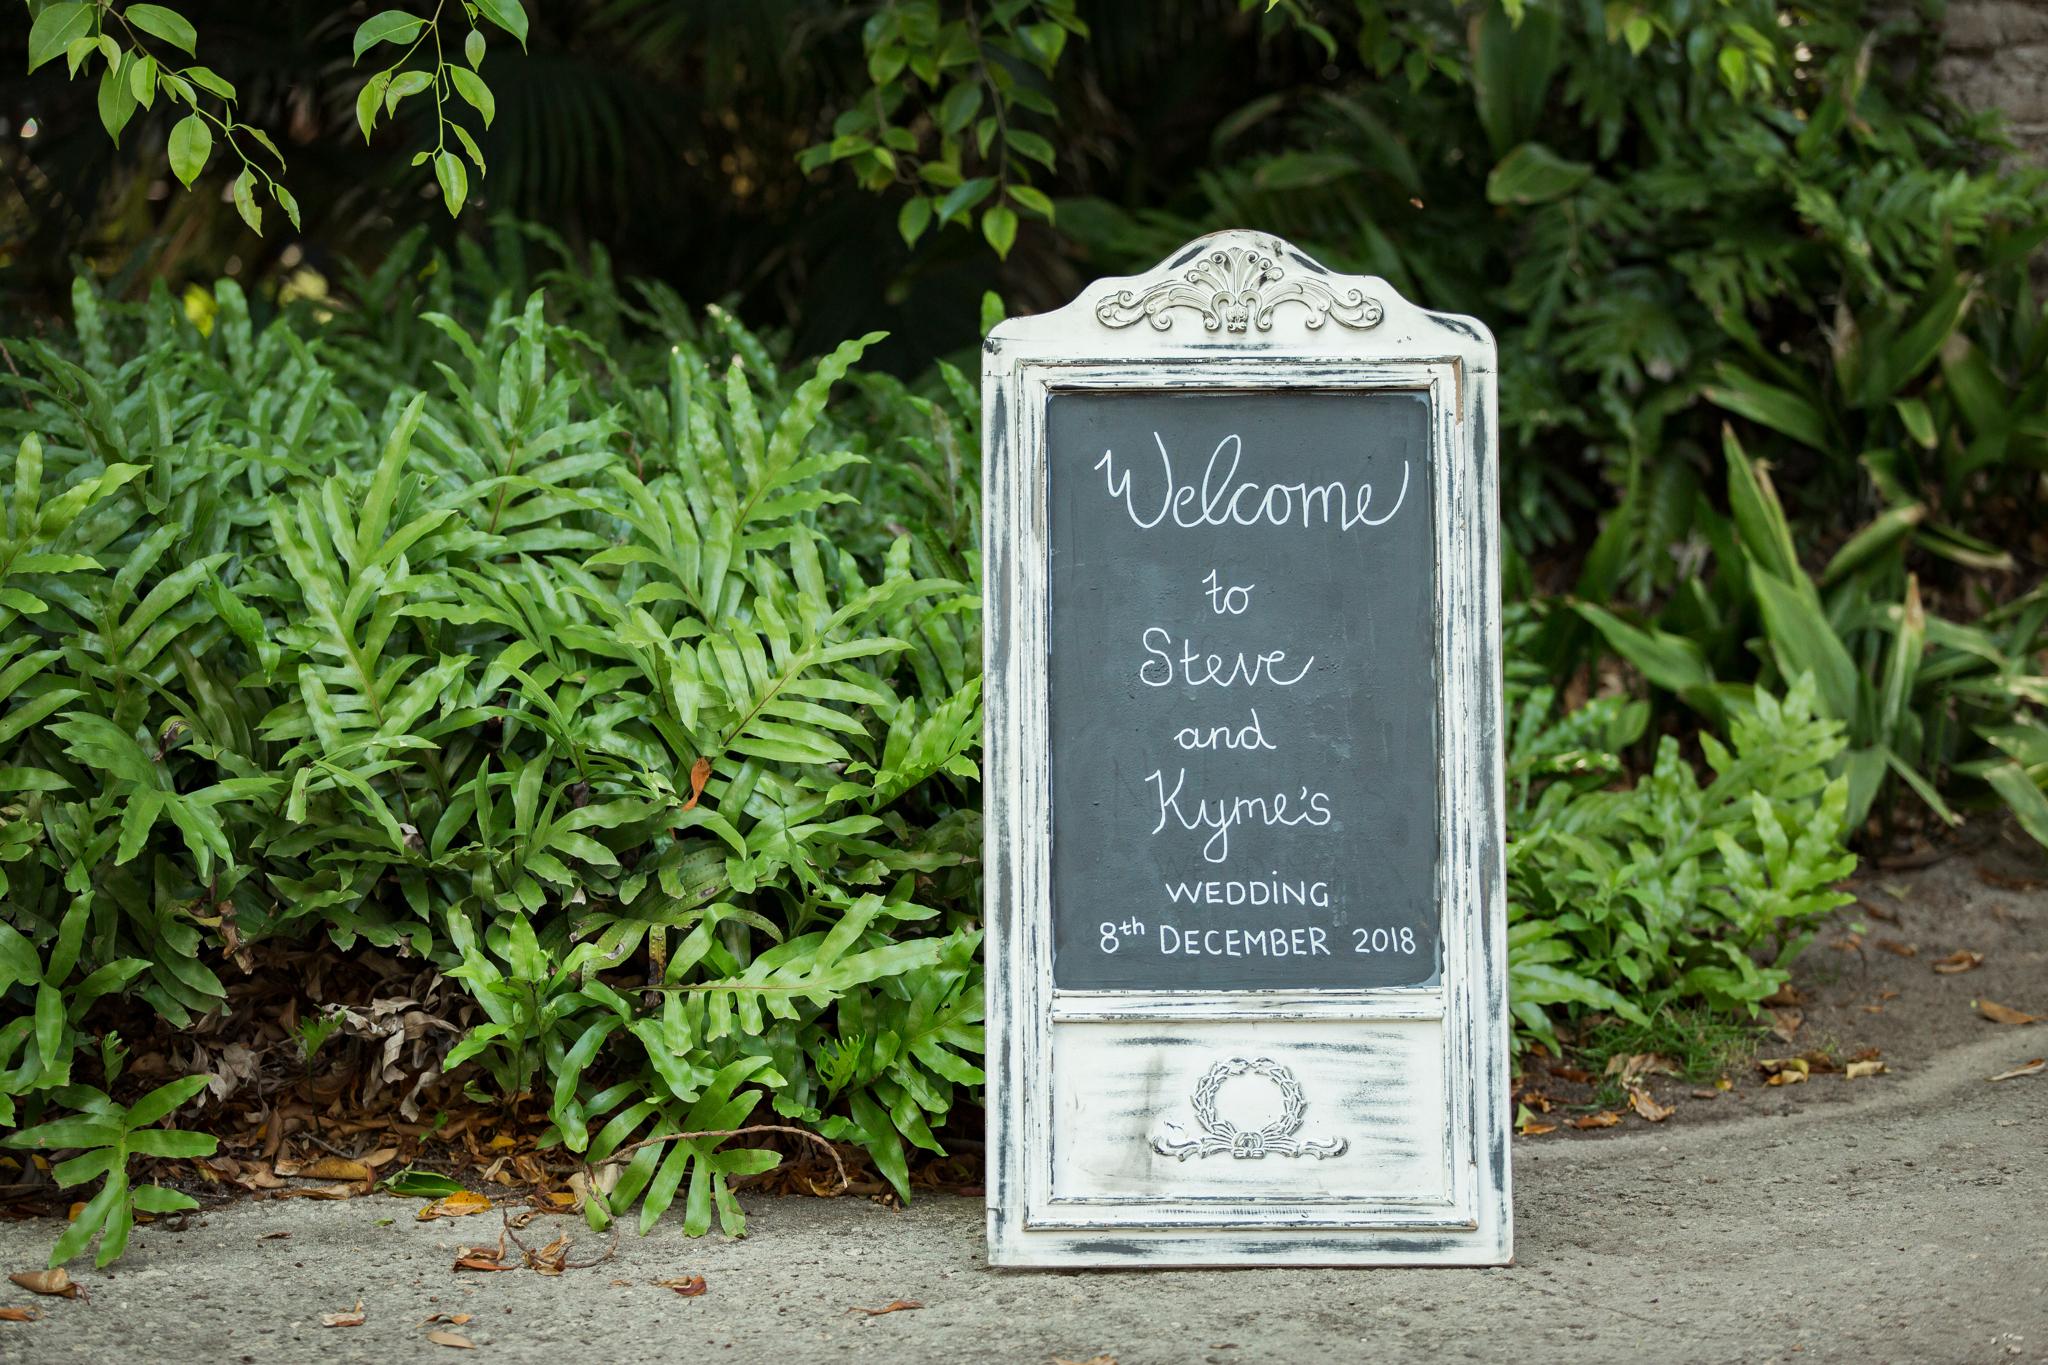 Kyme-steve-wedding-1.jpg